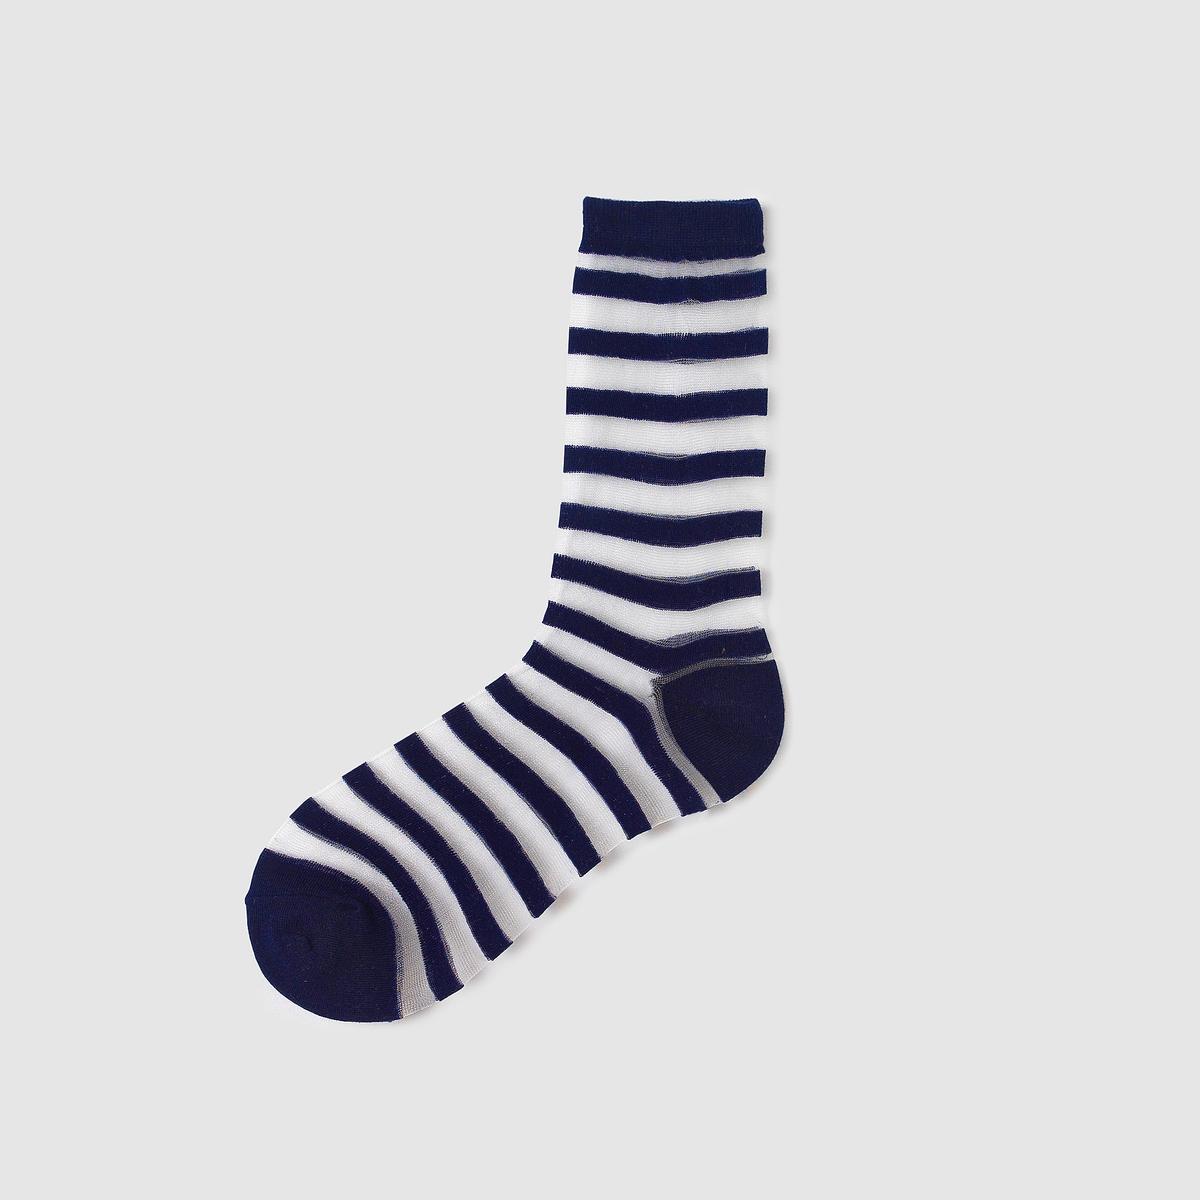 Носки в полоску прозрачные от La Redoute